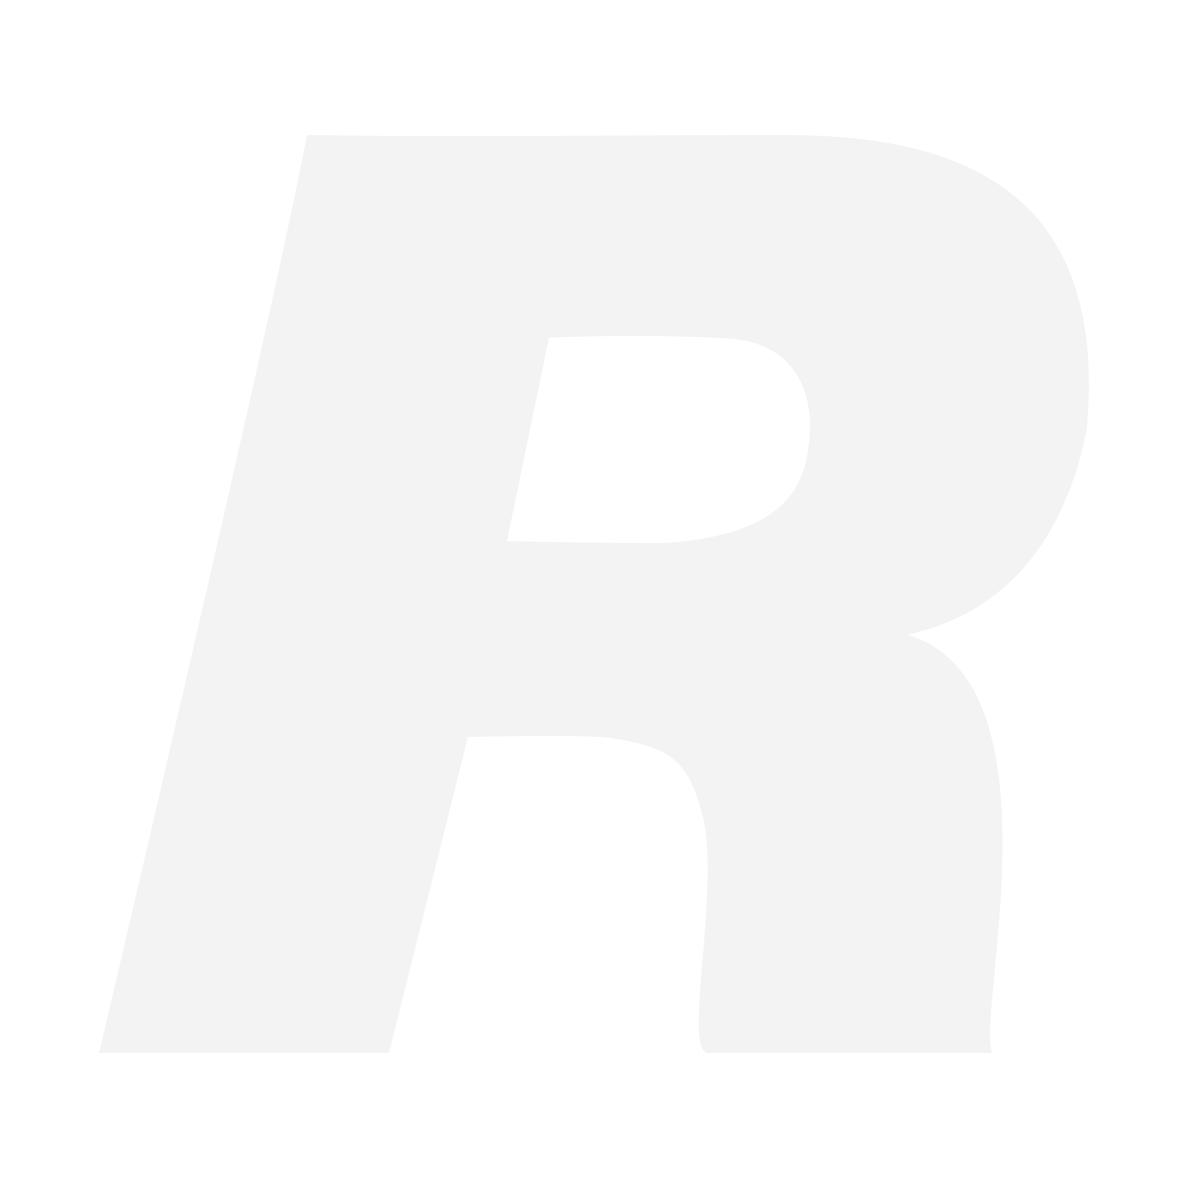 MAMIYA-SEKOR Z 180mm f/4.5 KÄYTETTY (SIS. ALV 24%)